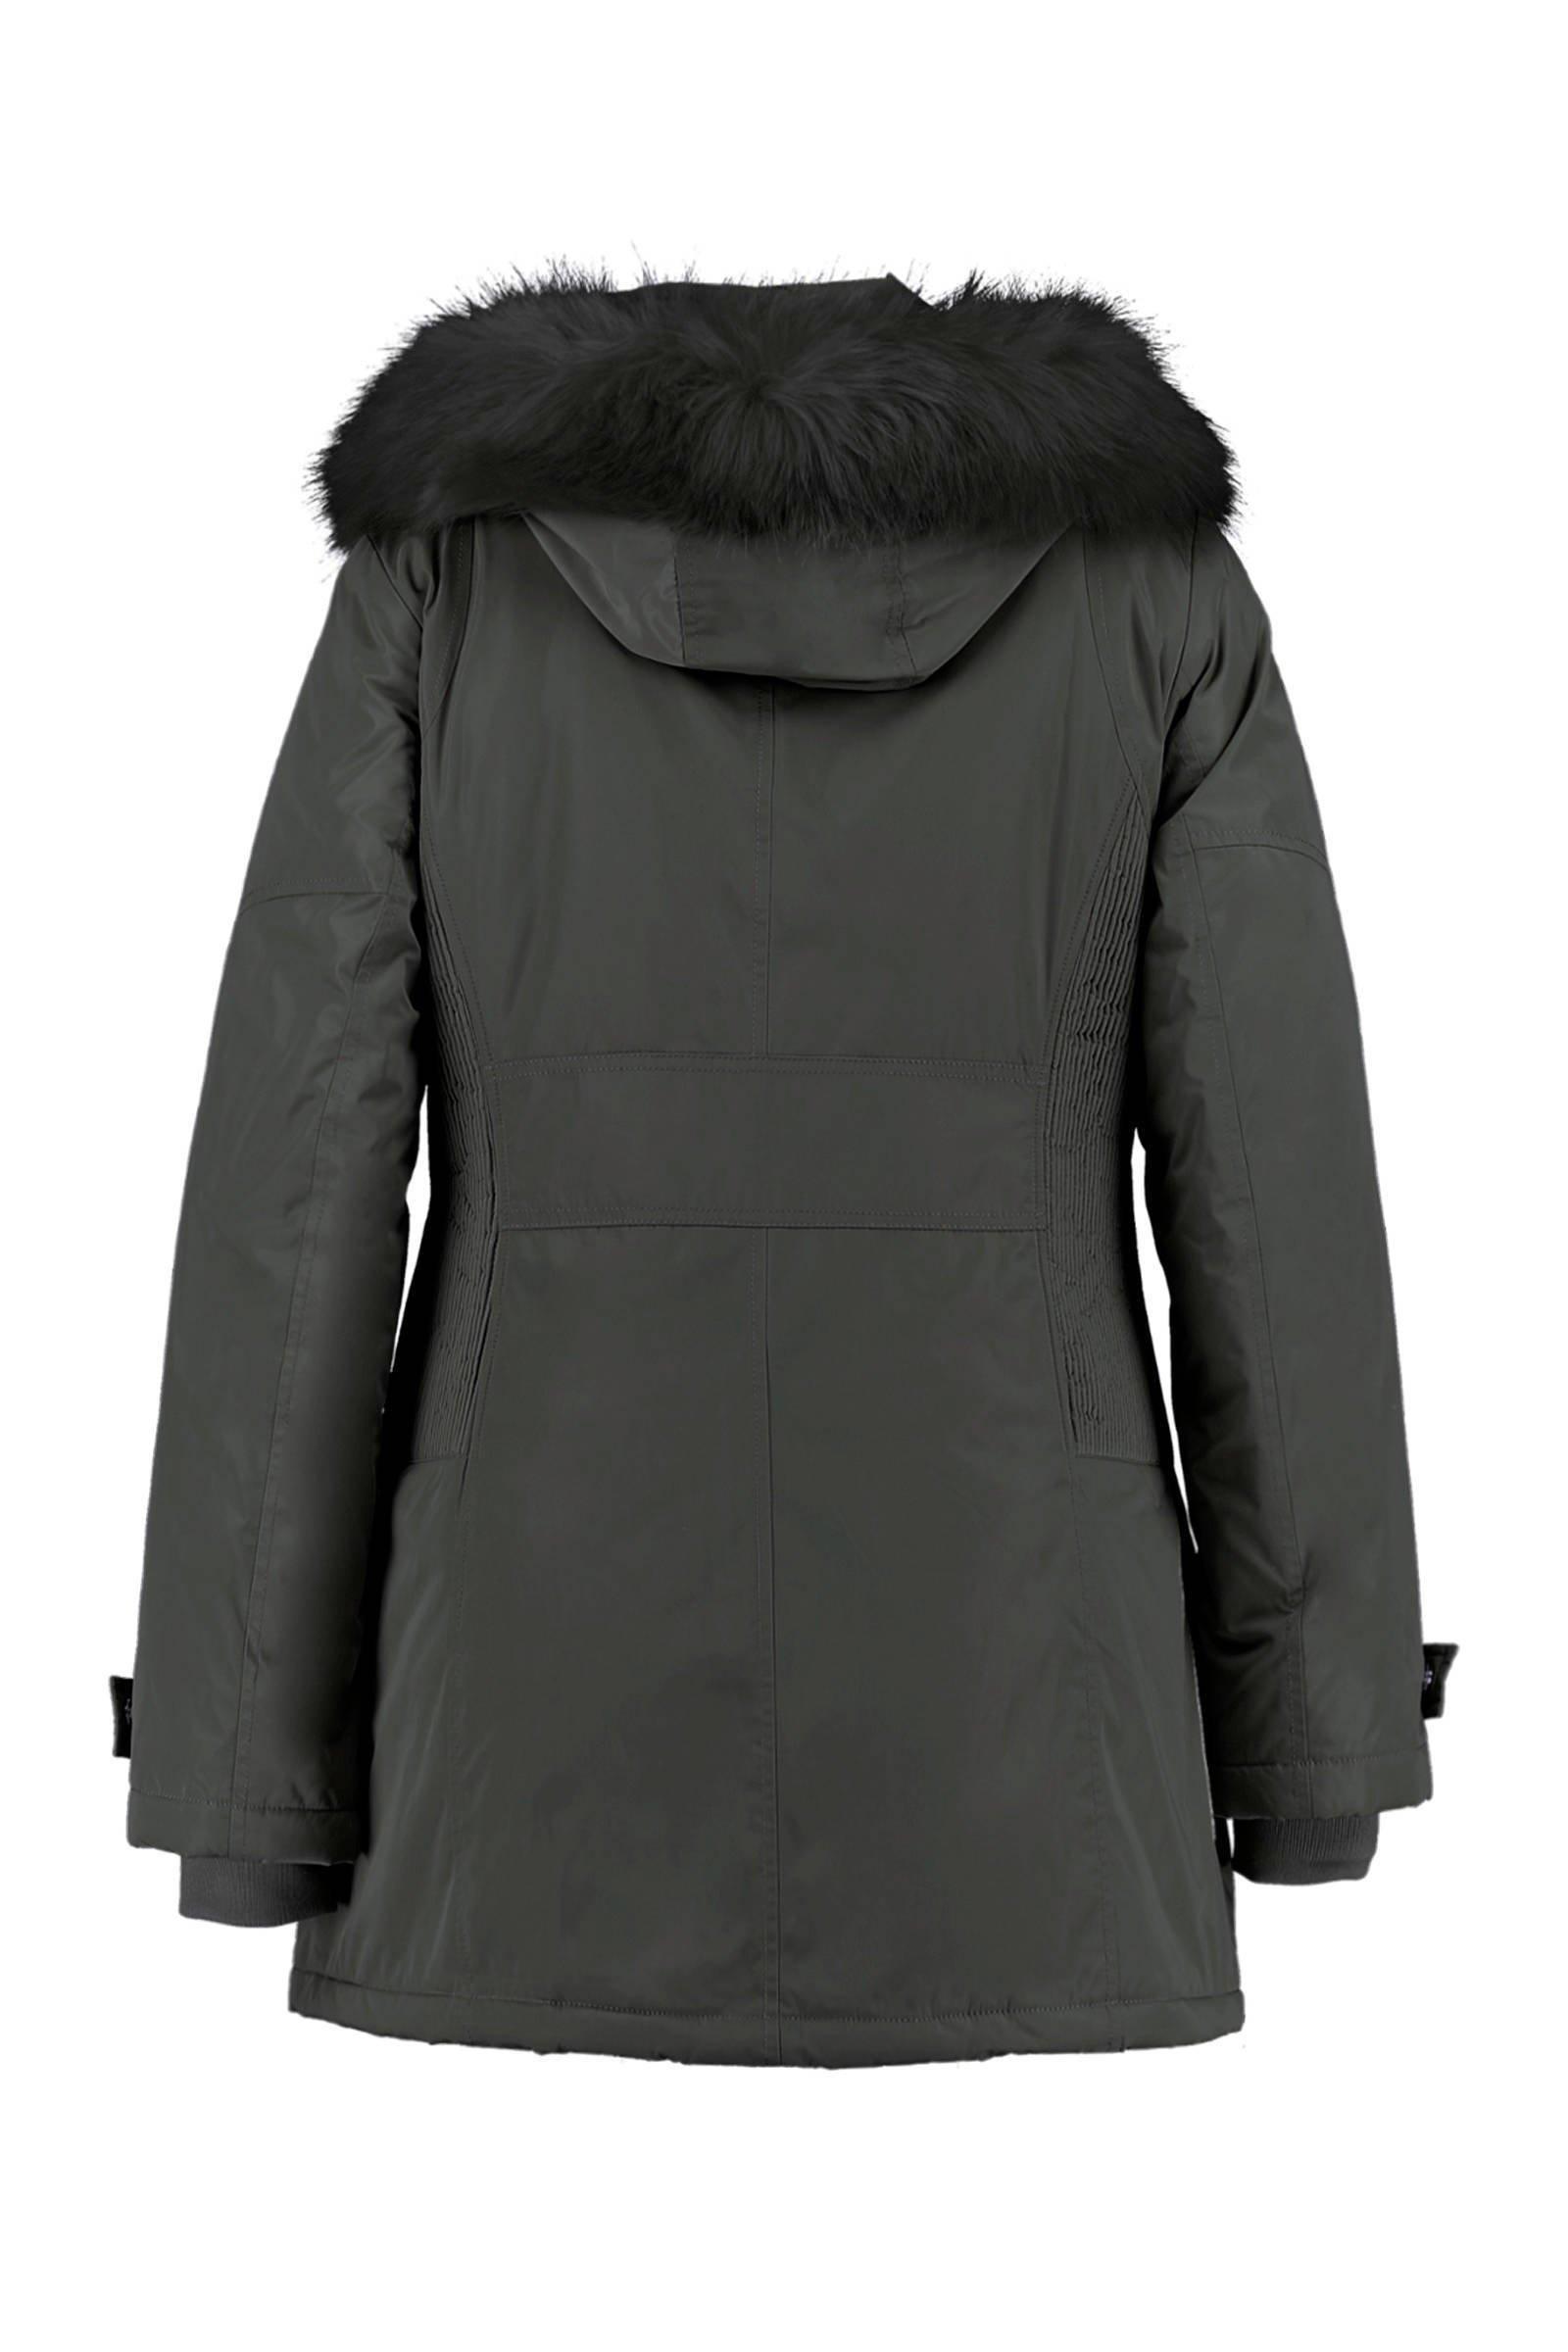 MS Mode winterjas zwart   wehkamp